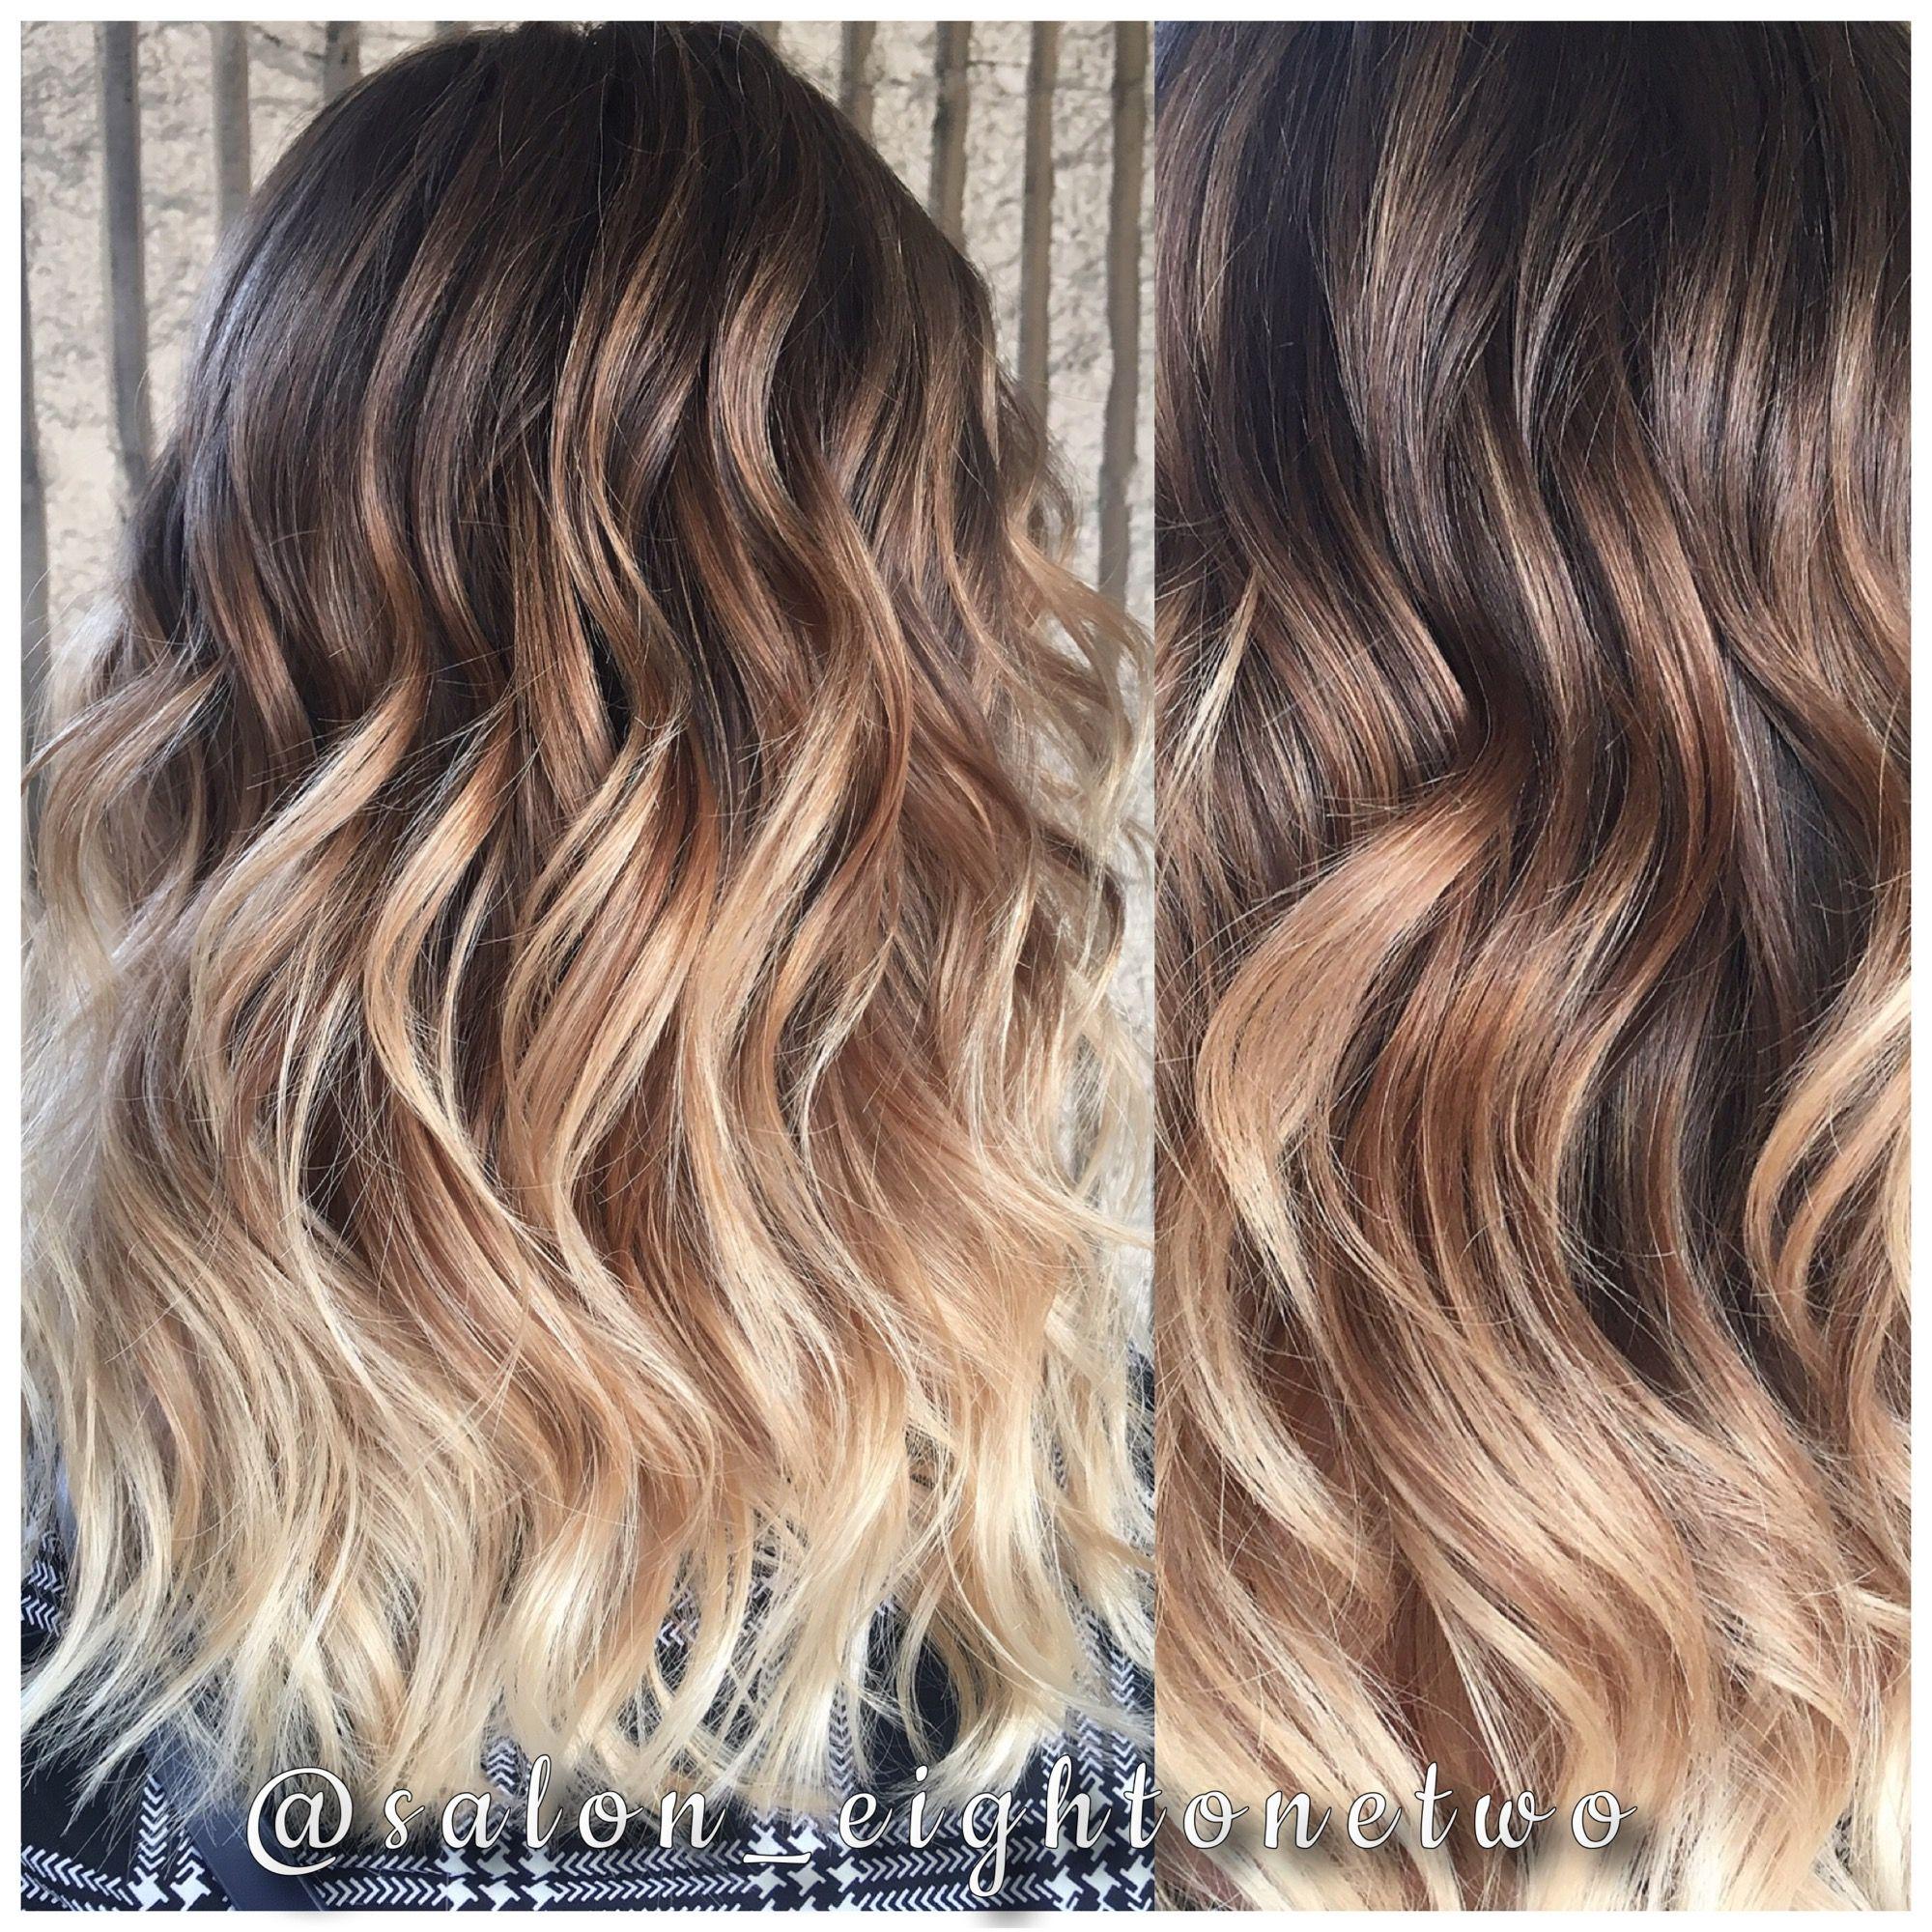 Balayage Red Hair Fall Hair Blonde Hair Highlights Beachy Waves